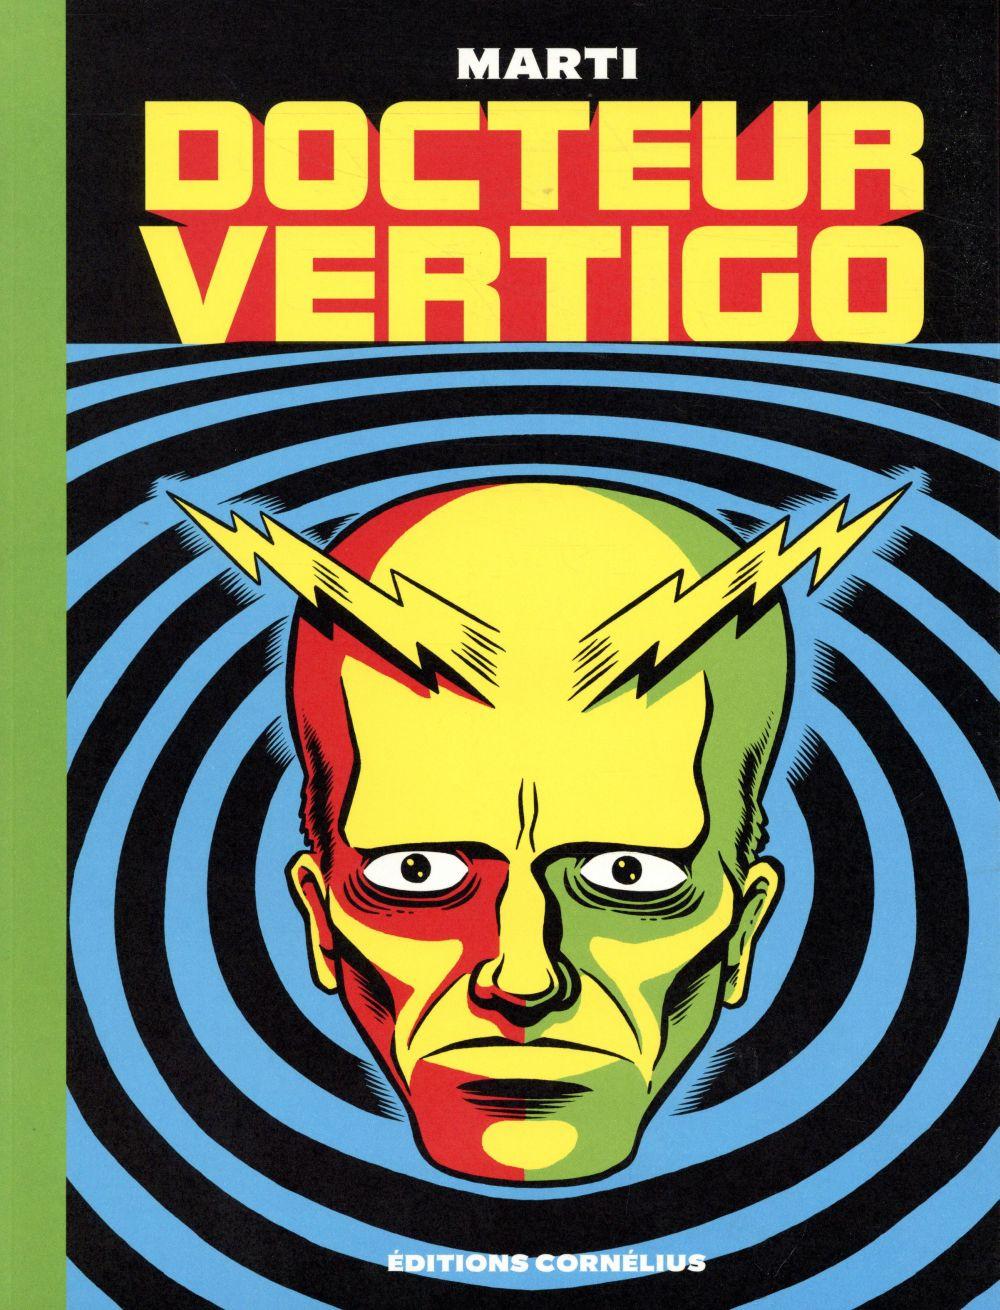 Docteur Vertigo